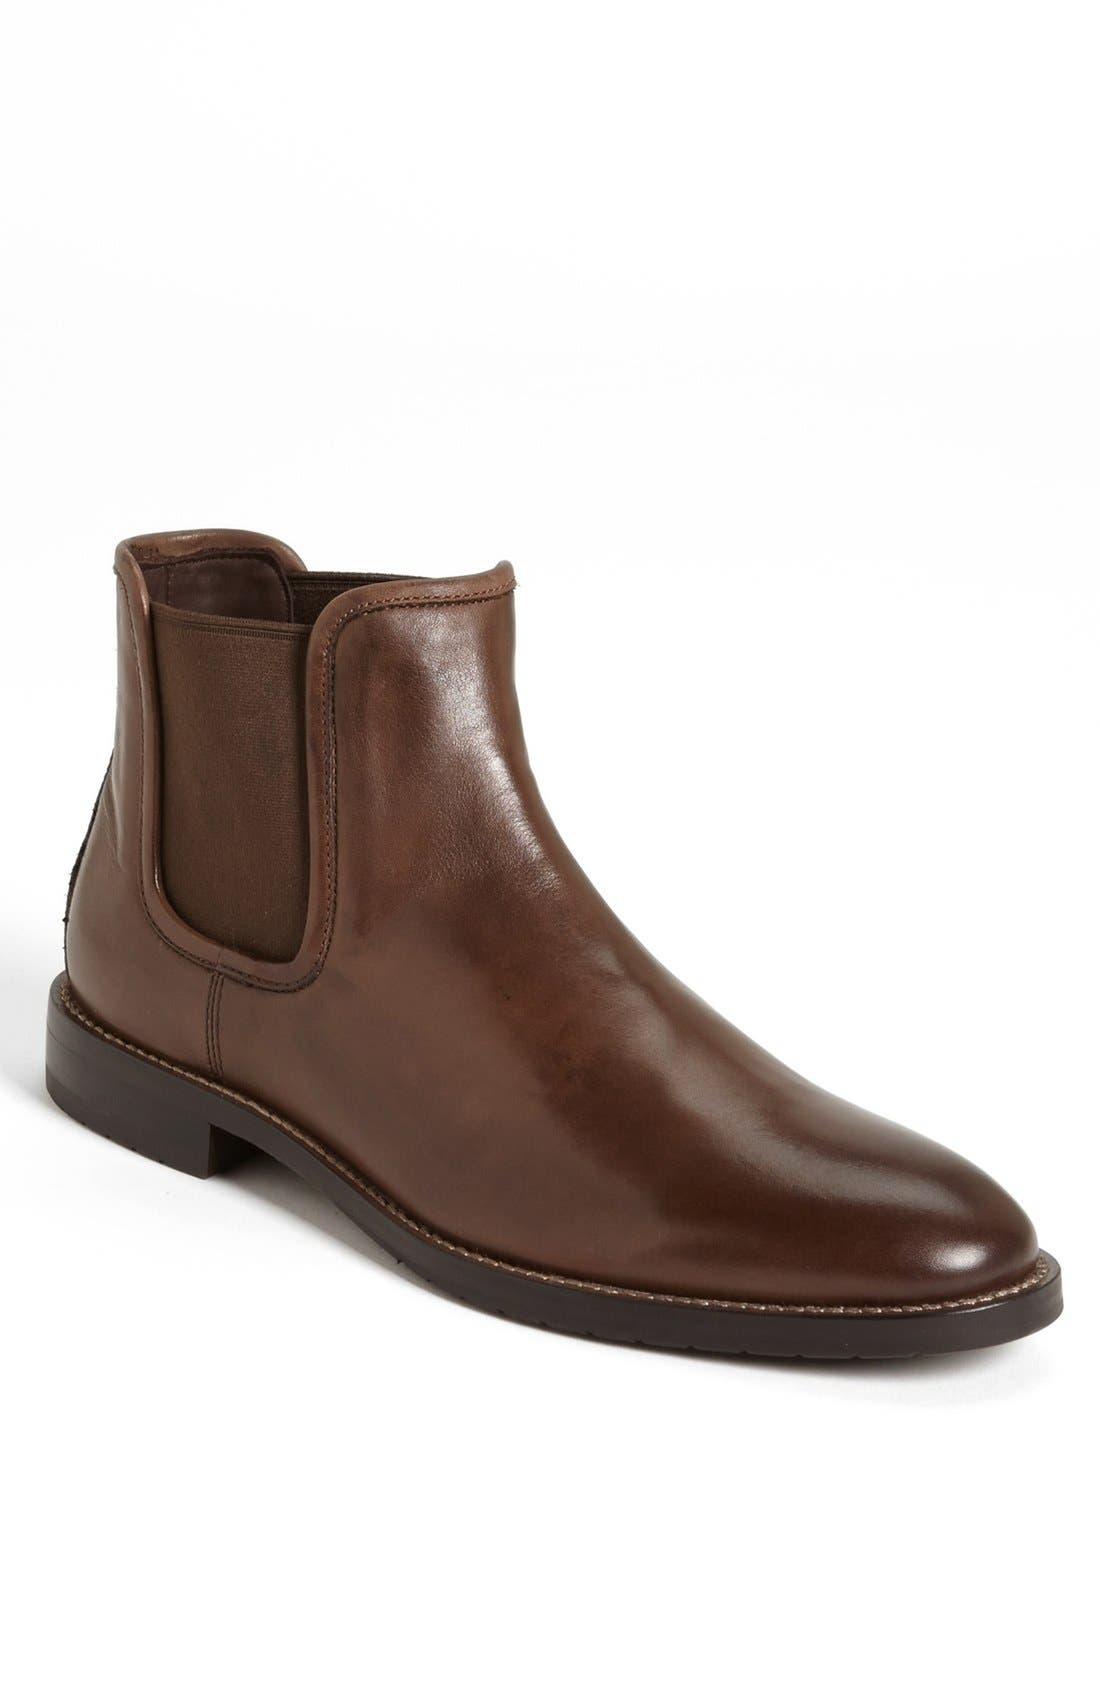 Alternate Image 1 Selected - Gordon Rush 'Patterson' Chelsea Boot